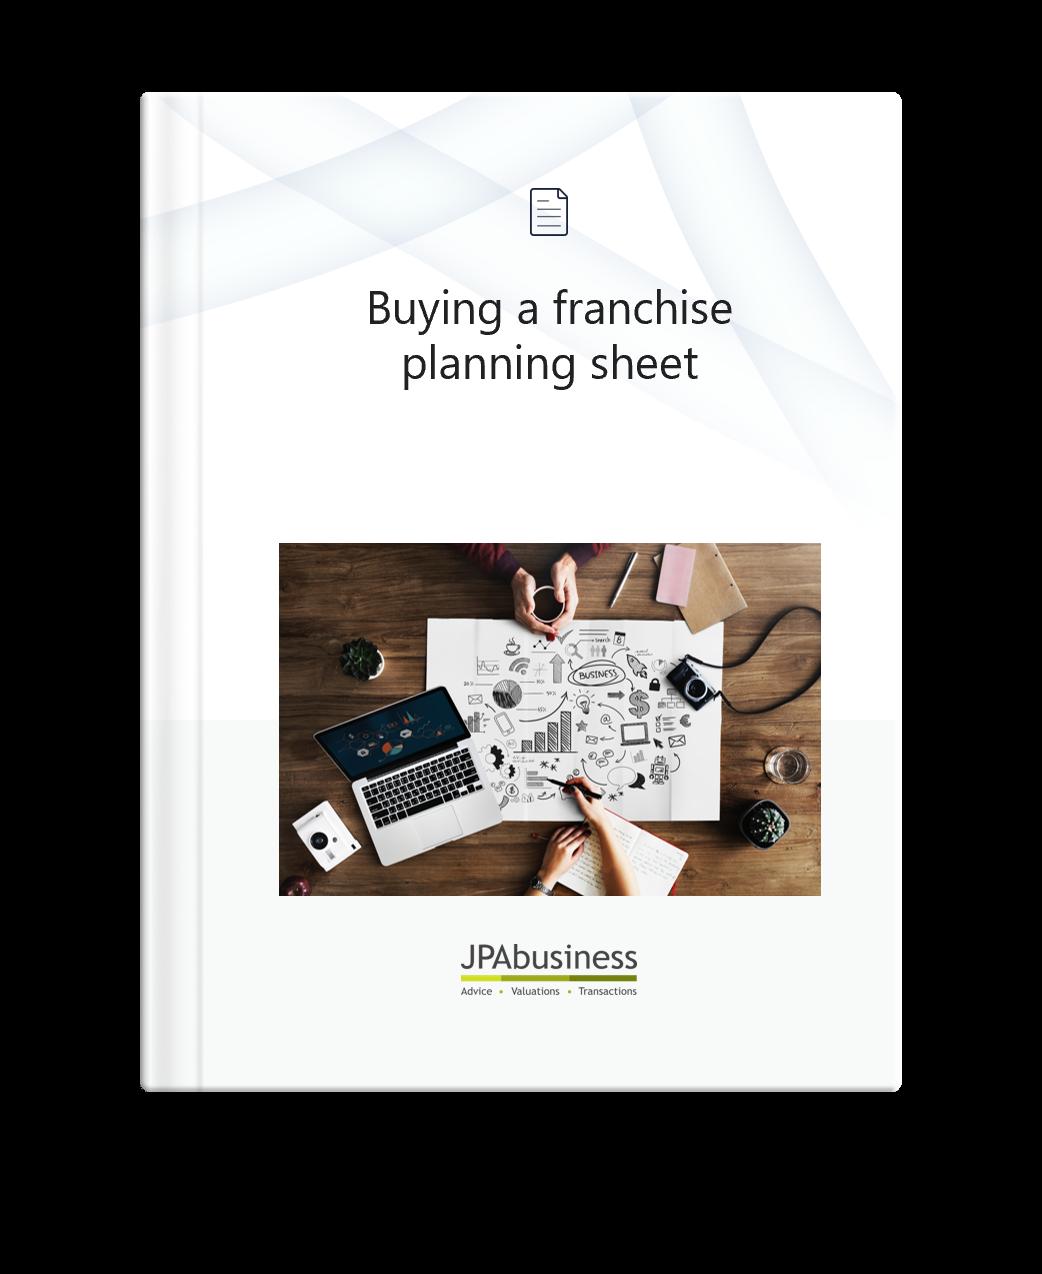 Buying a franchise planning sheet   JPAbusiness